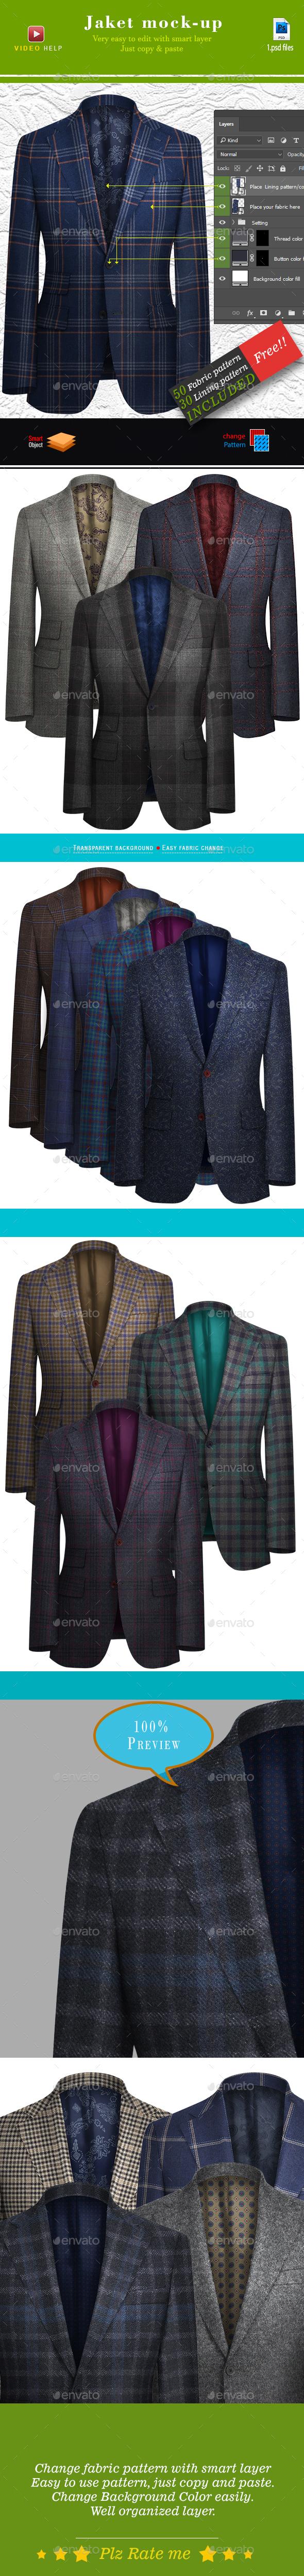 Jacket Mockup - Apparel Product Mock-Ups